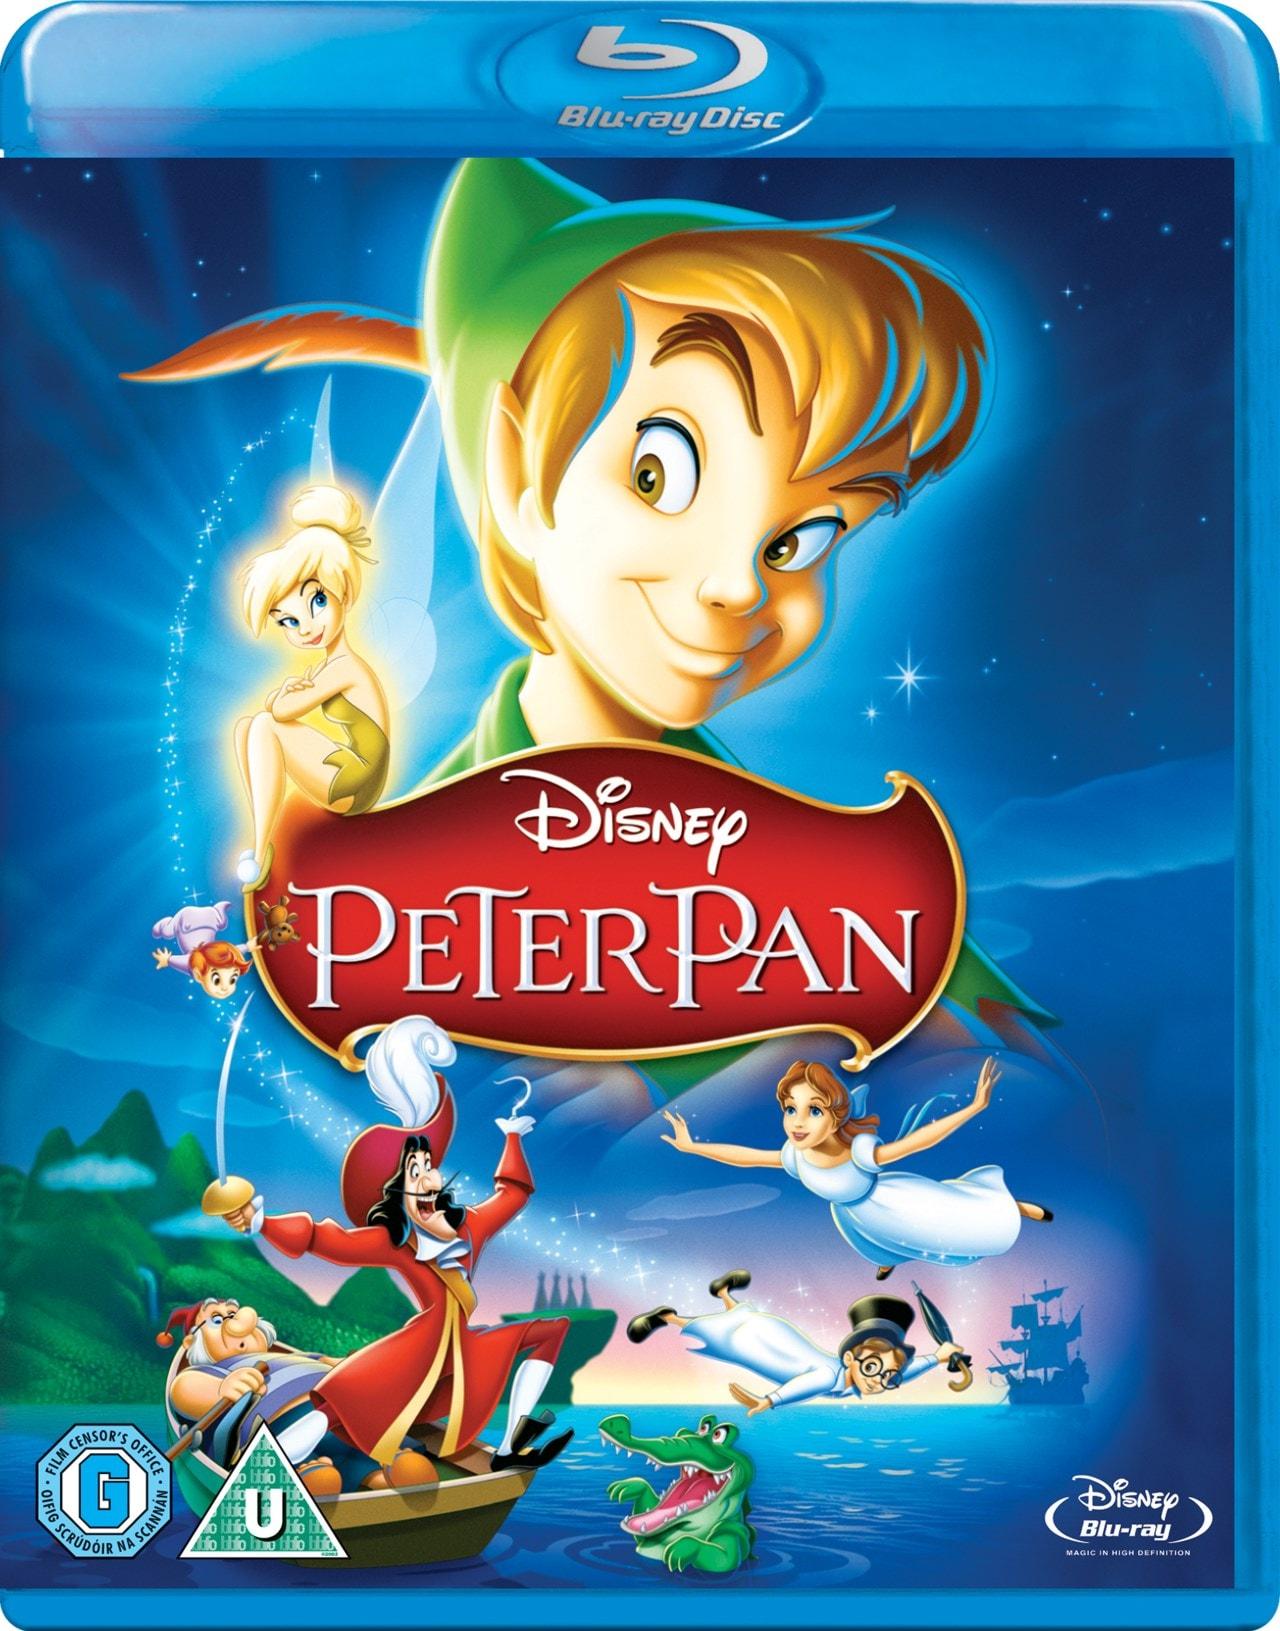 Peter Pan (Disney) - 3